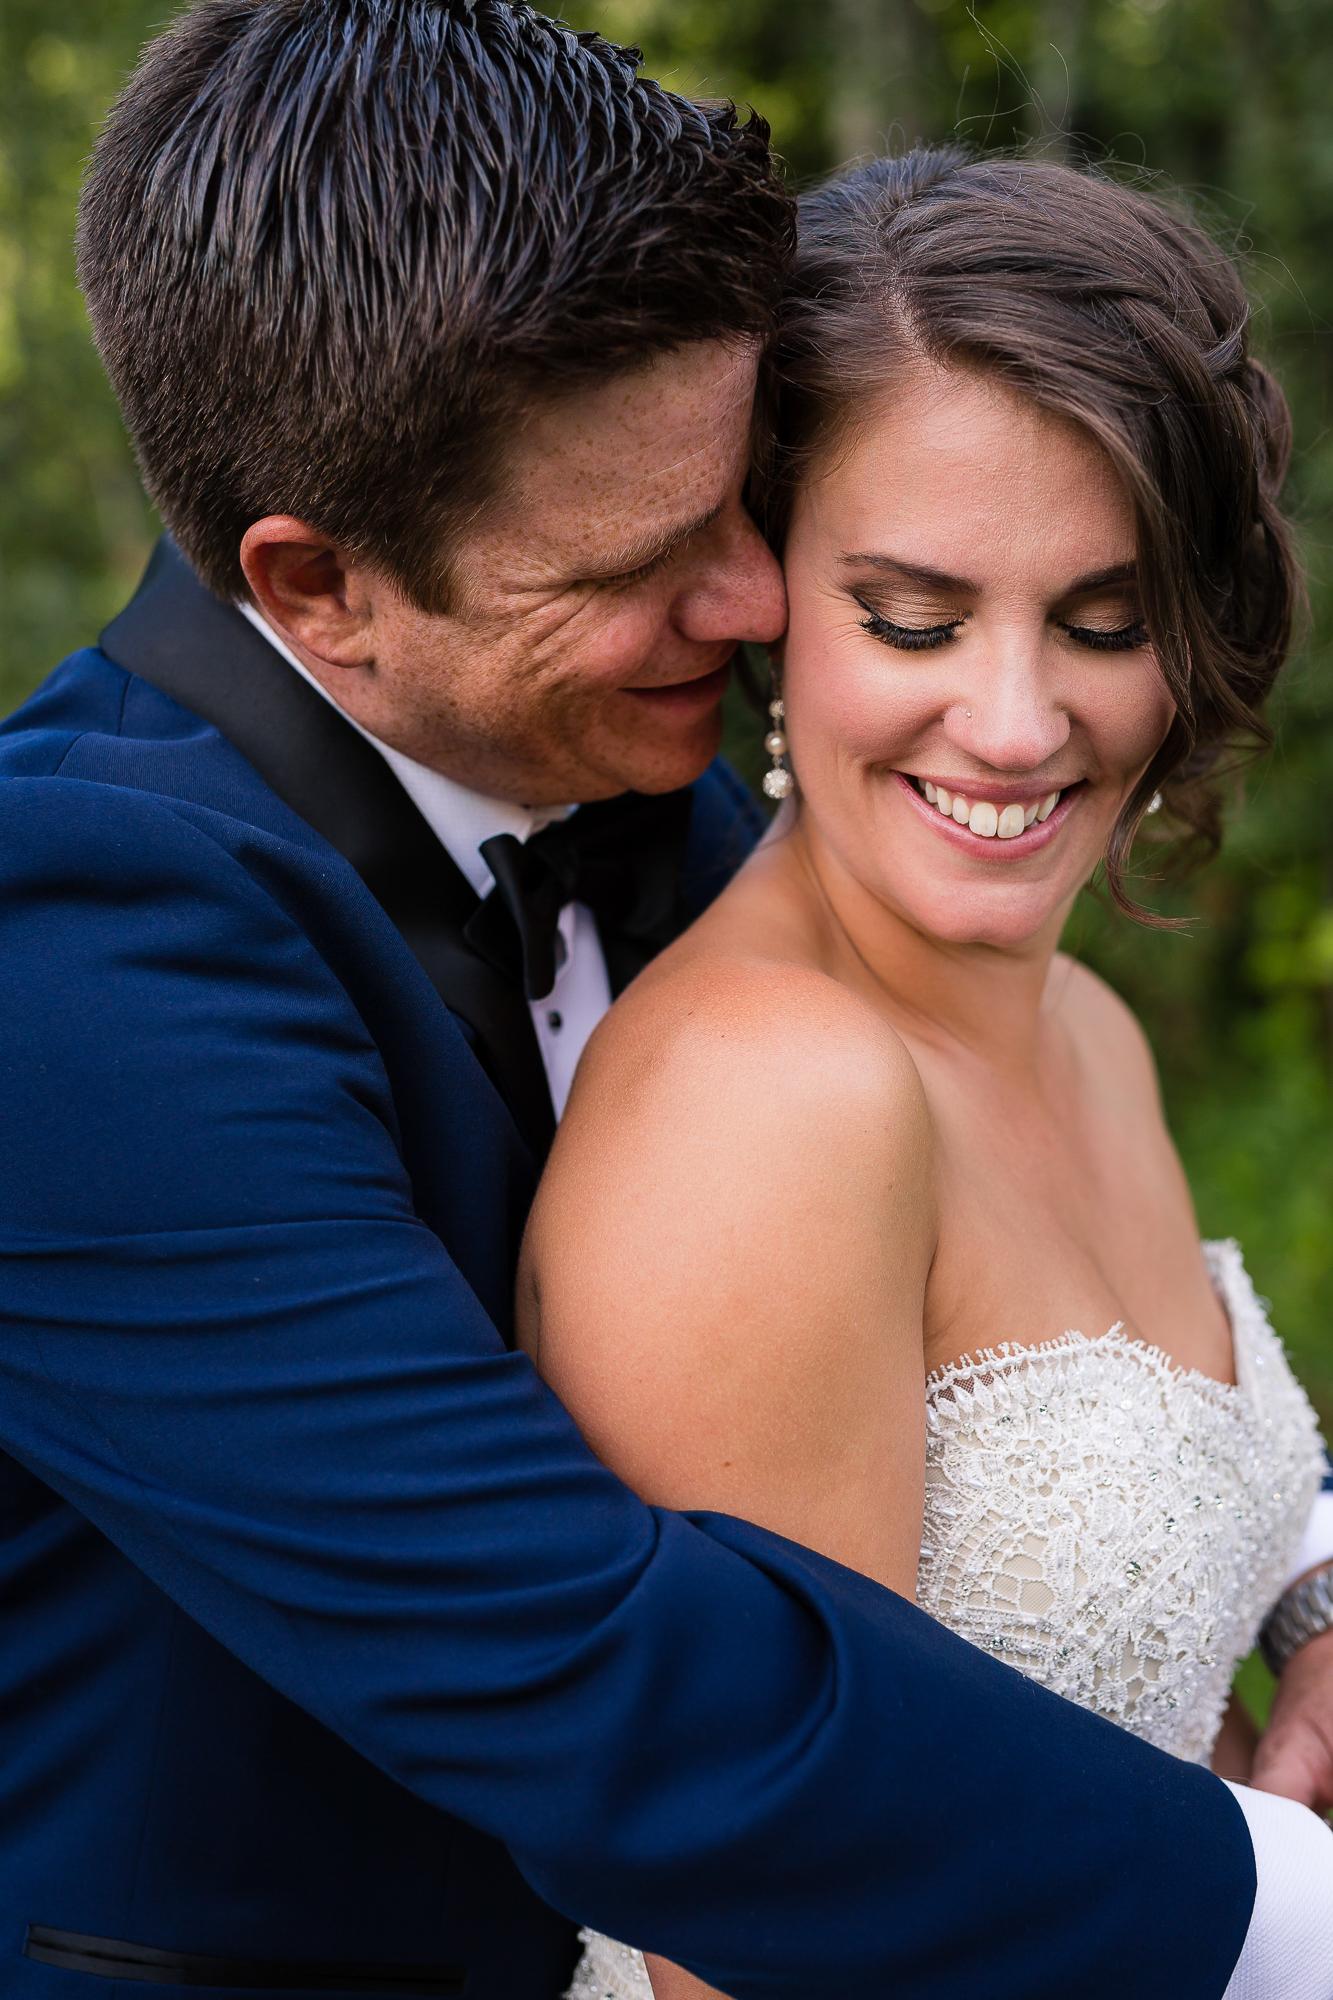 Wedding Photographers Edmonton-33.jpg